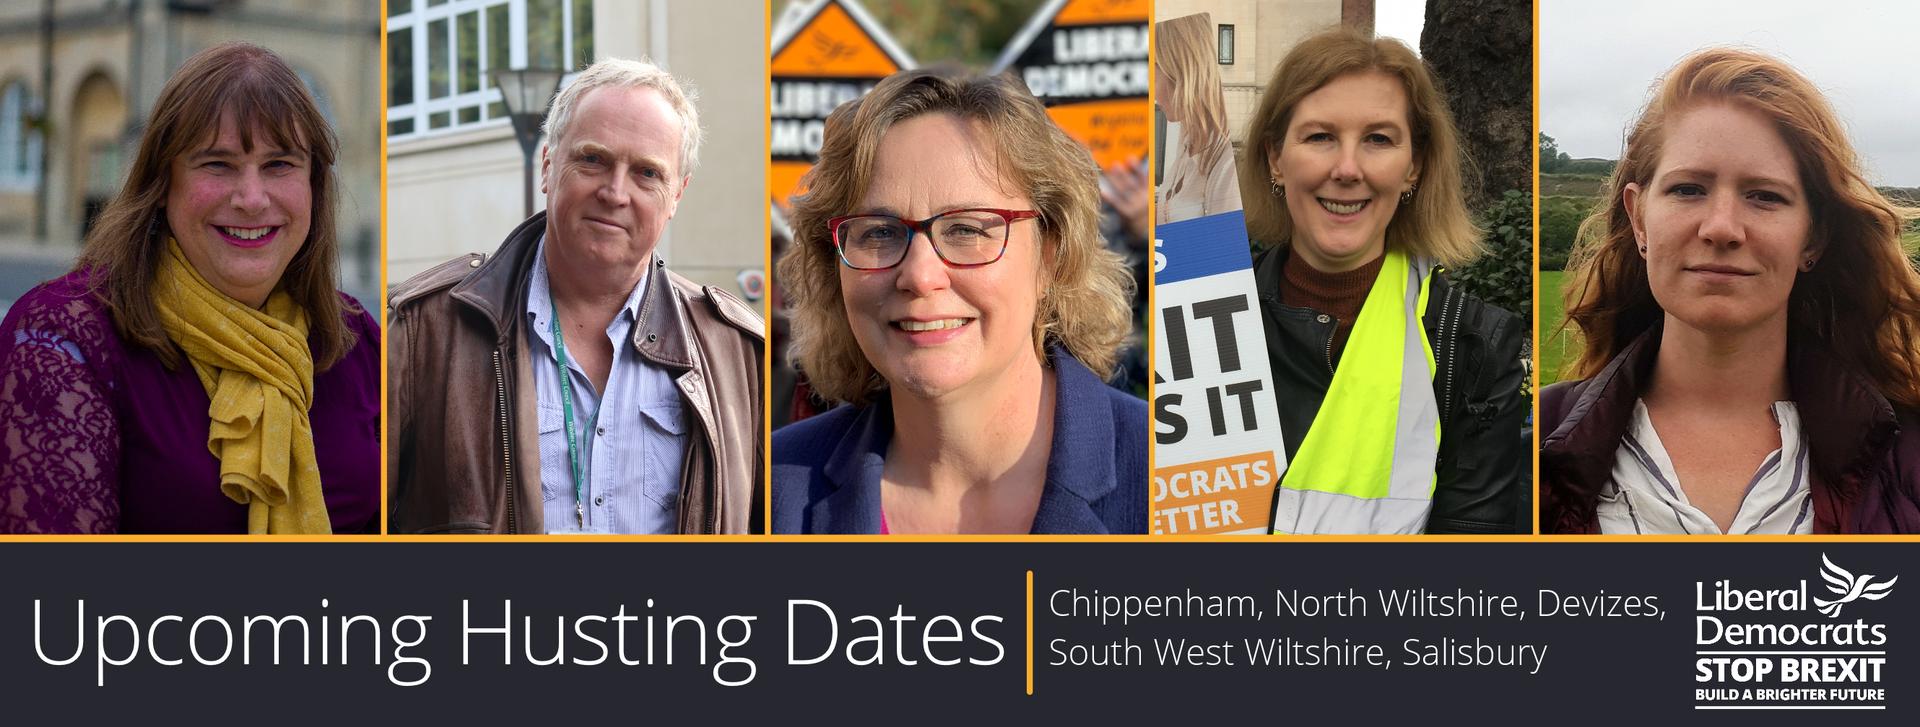 Upcoming Hustings (Wiltshire Liberal Democrats)